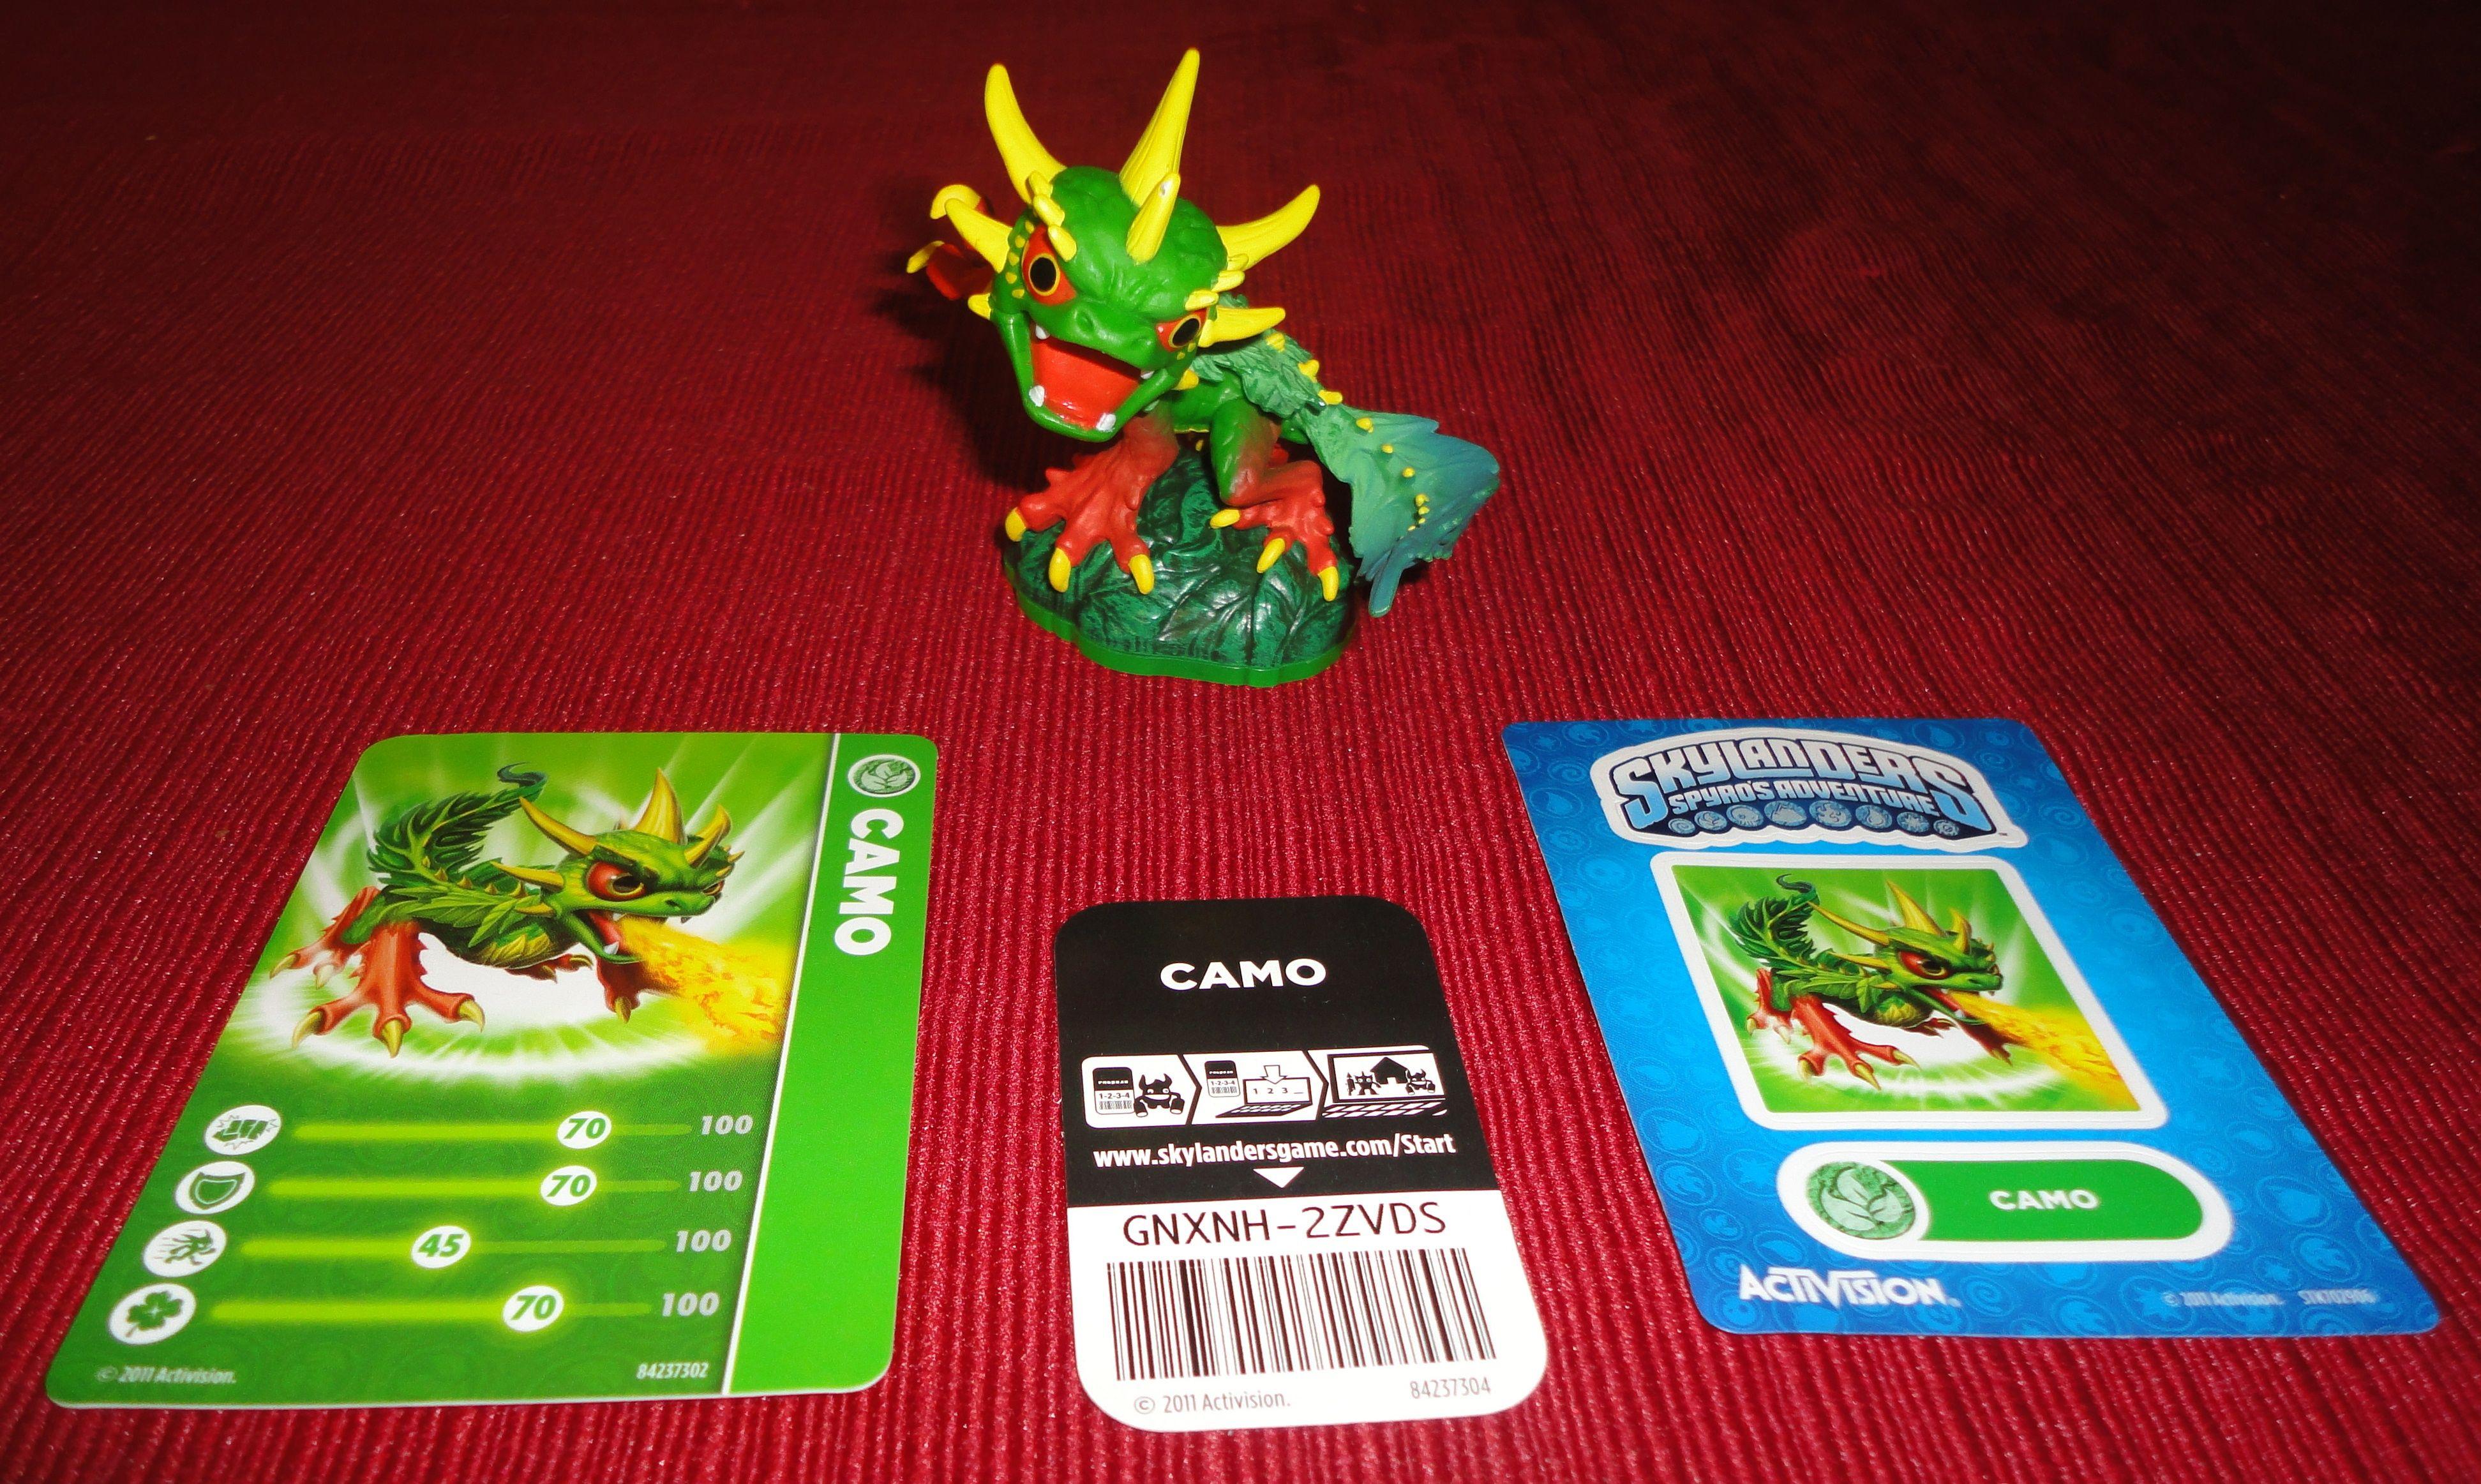 Skylanders Spyro's Adventure Camo W/ Trading Card, Code ...